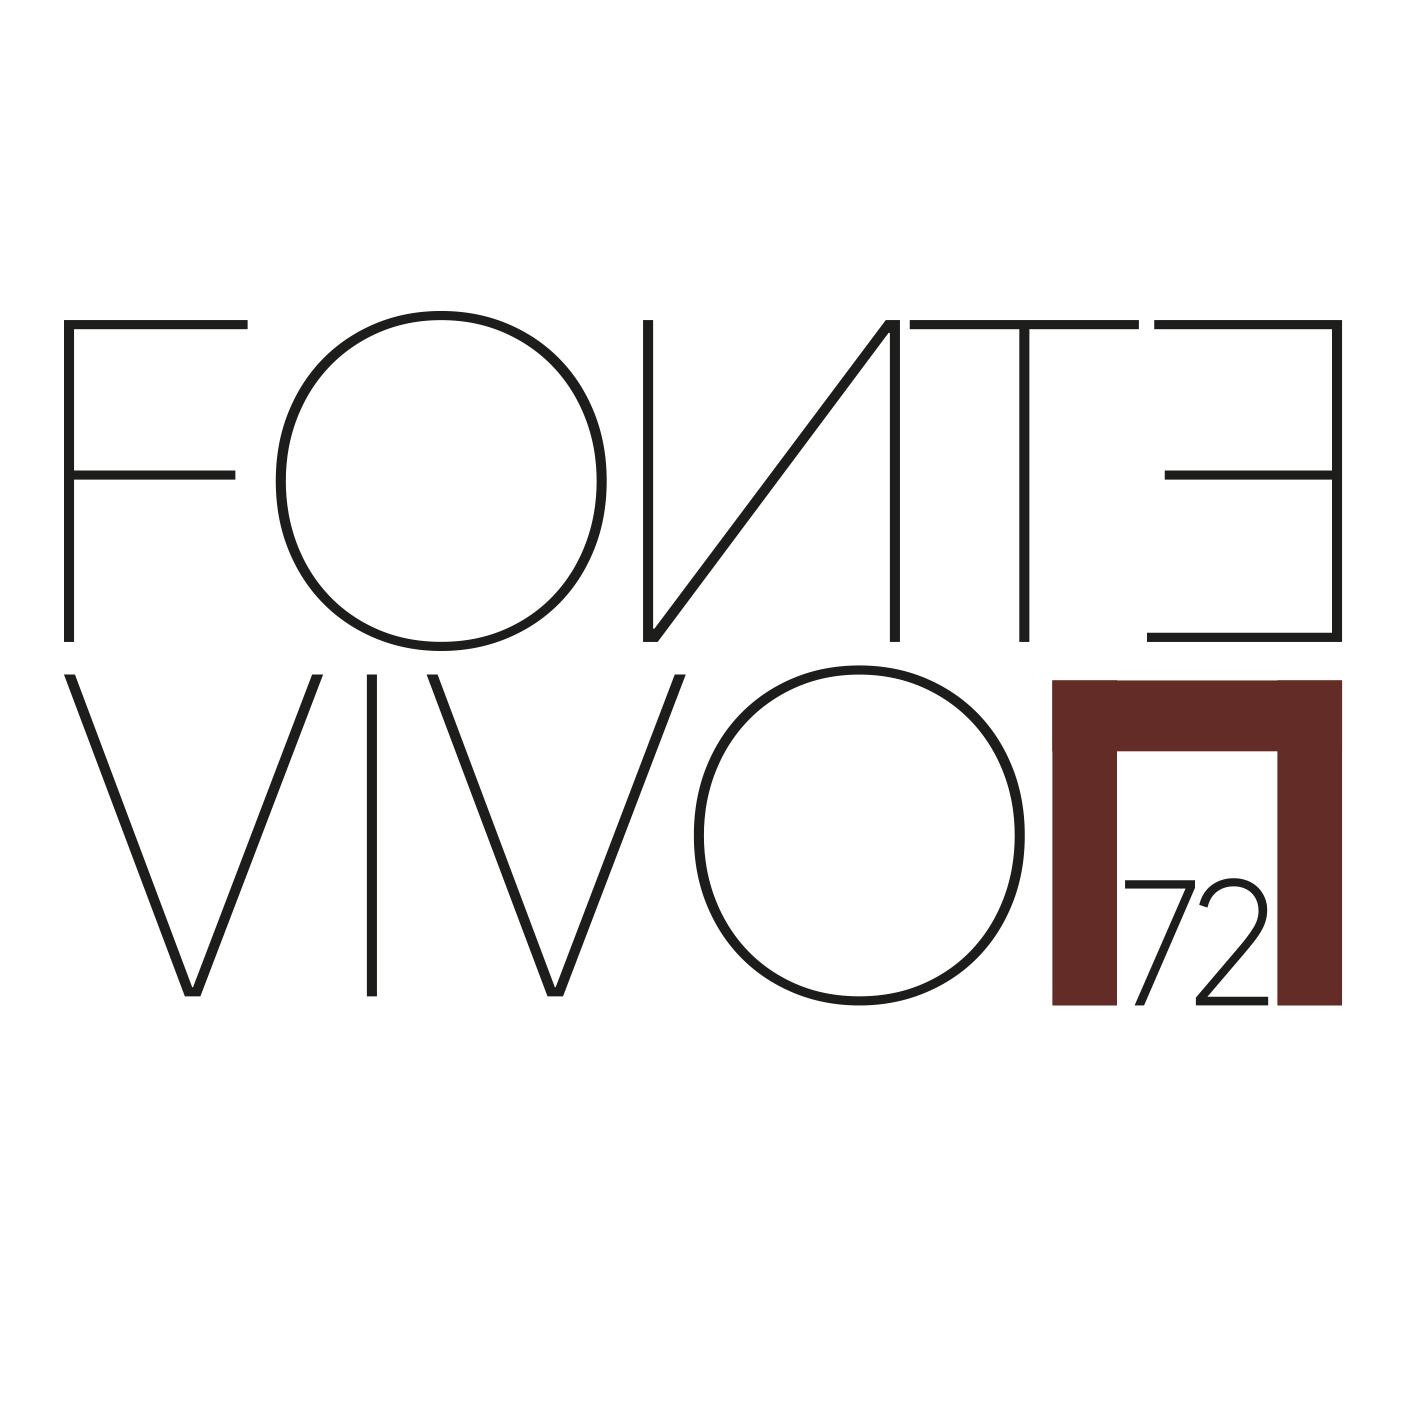 Fontevivo72